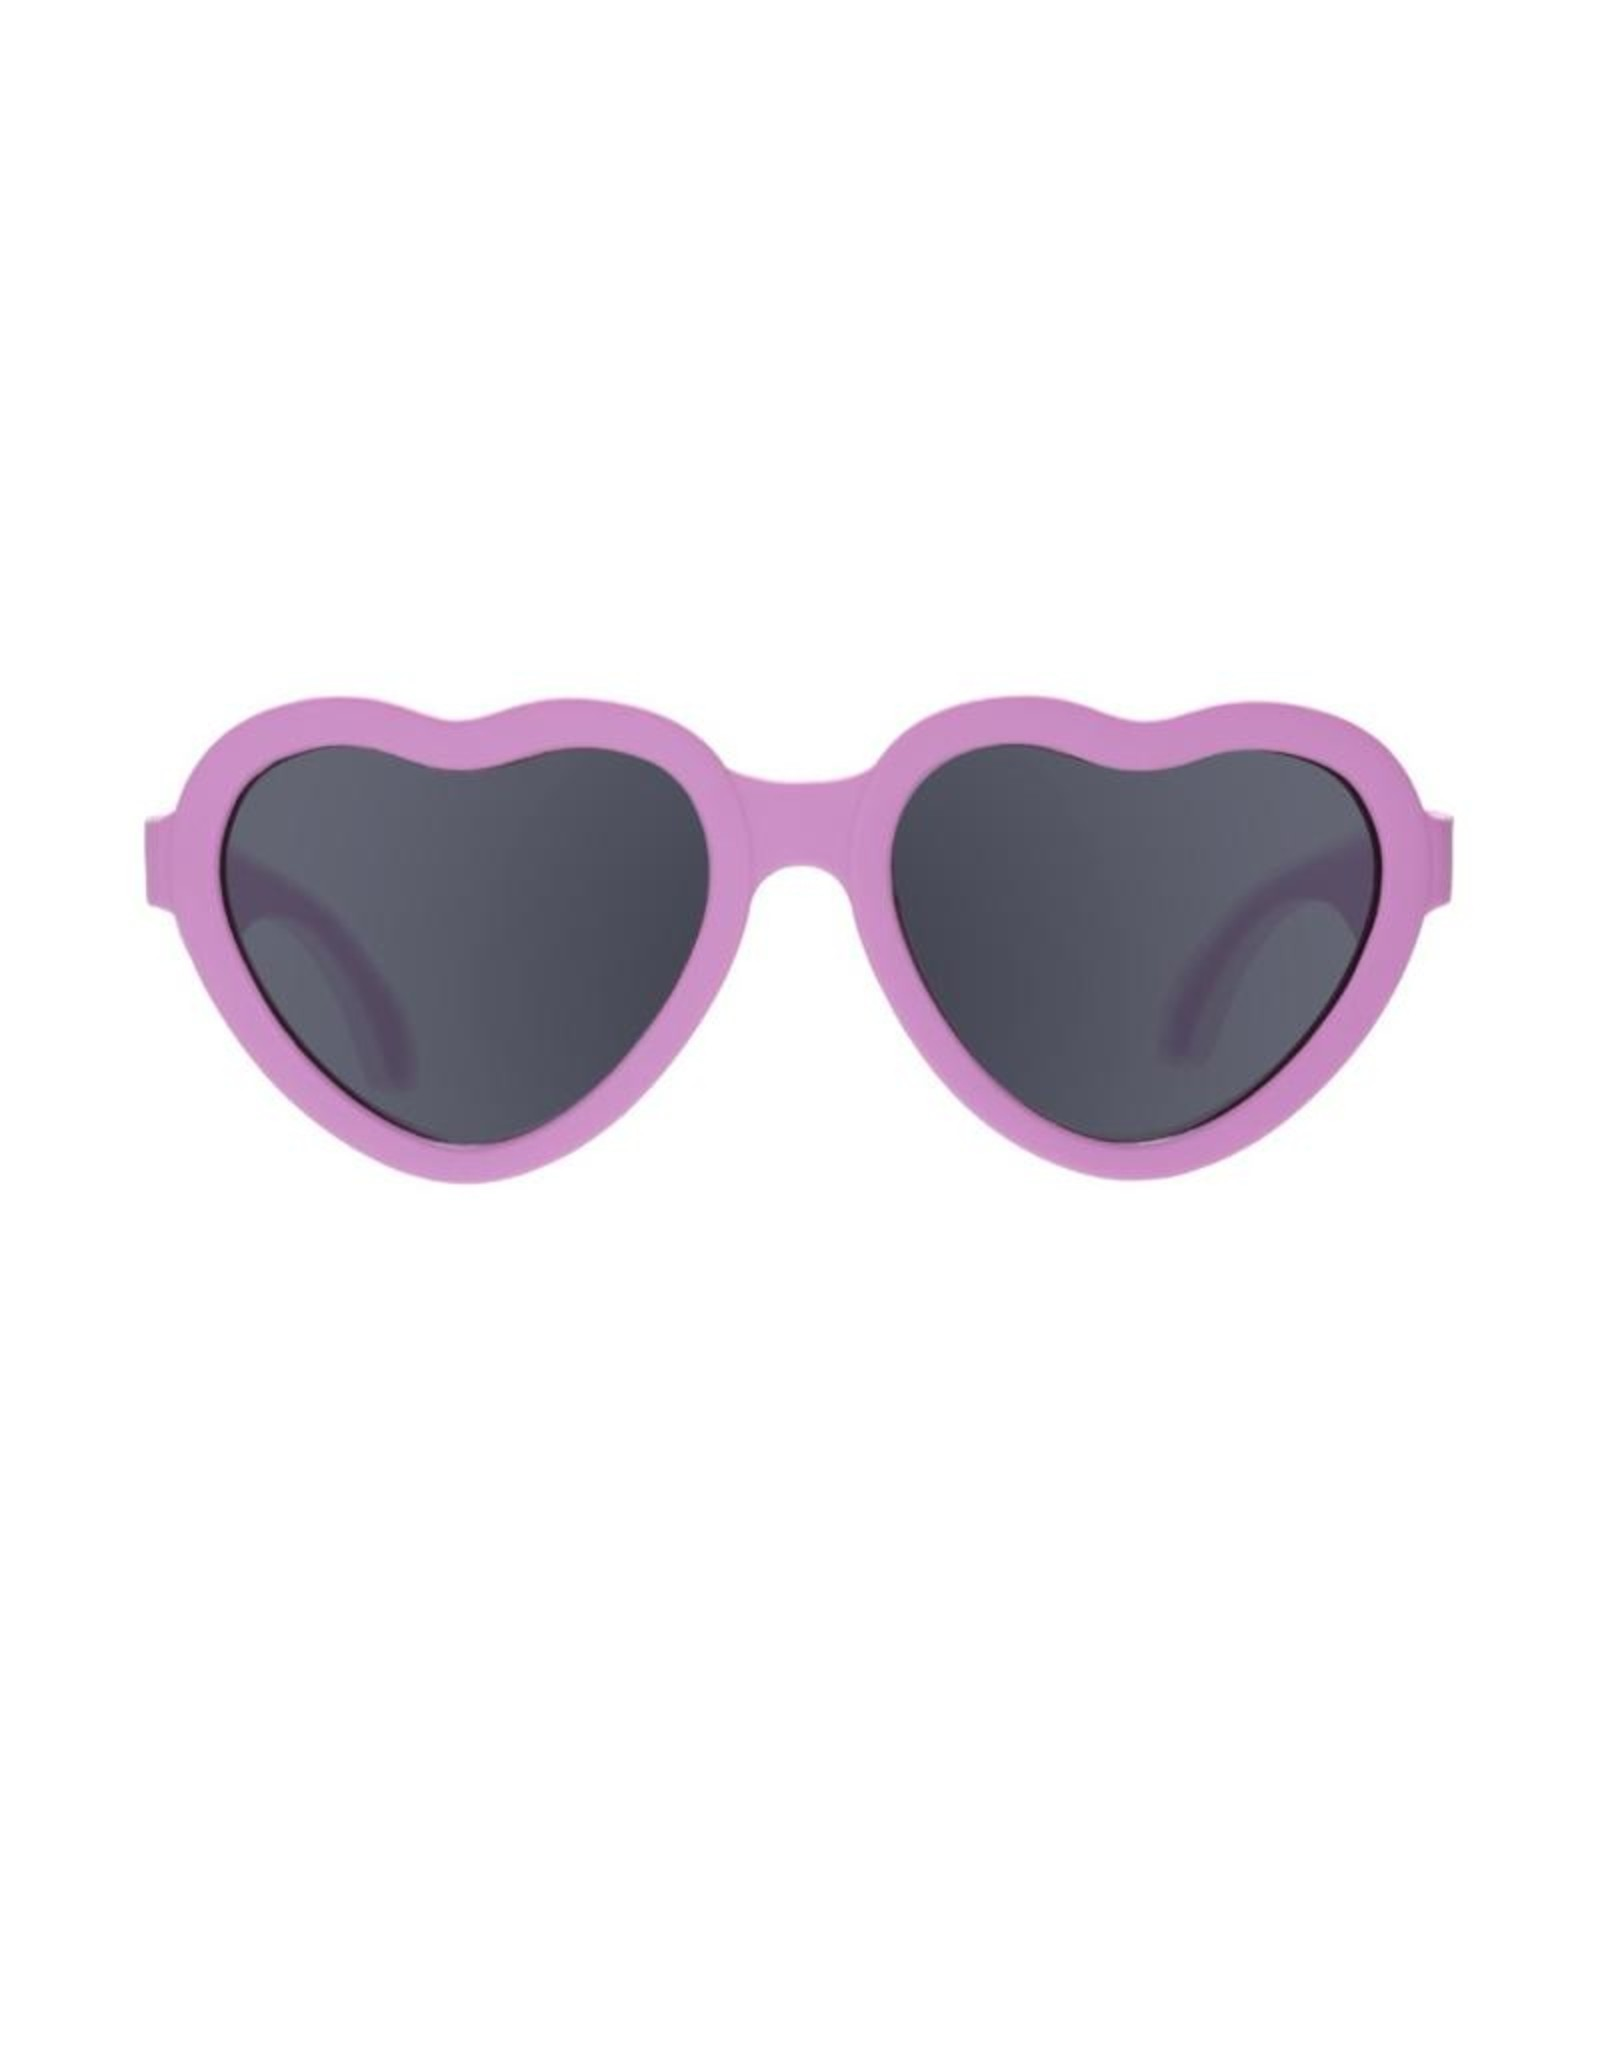 Babiators Original Cat-Eye Sunglasses Pink Lady